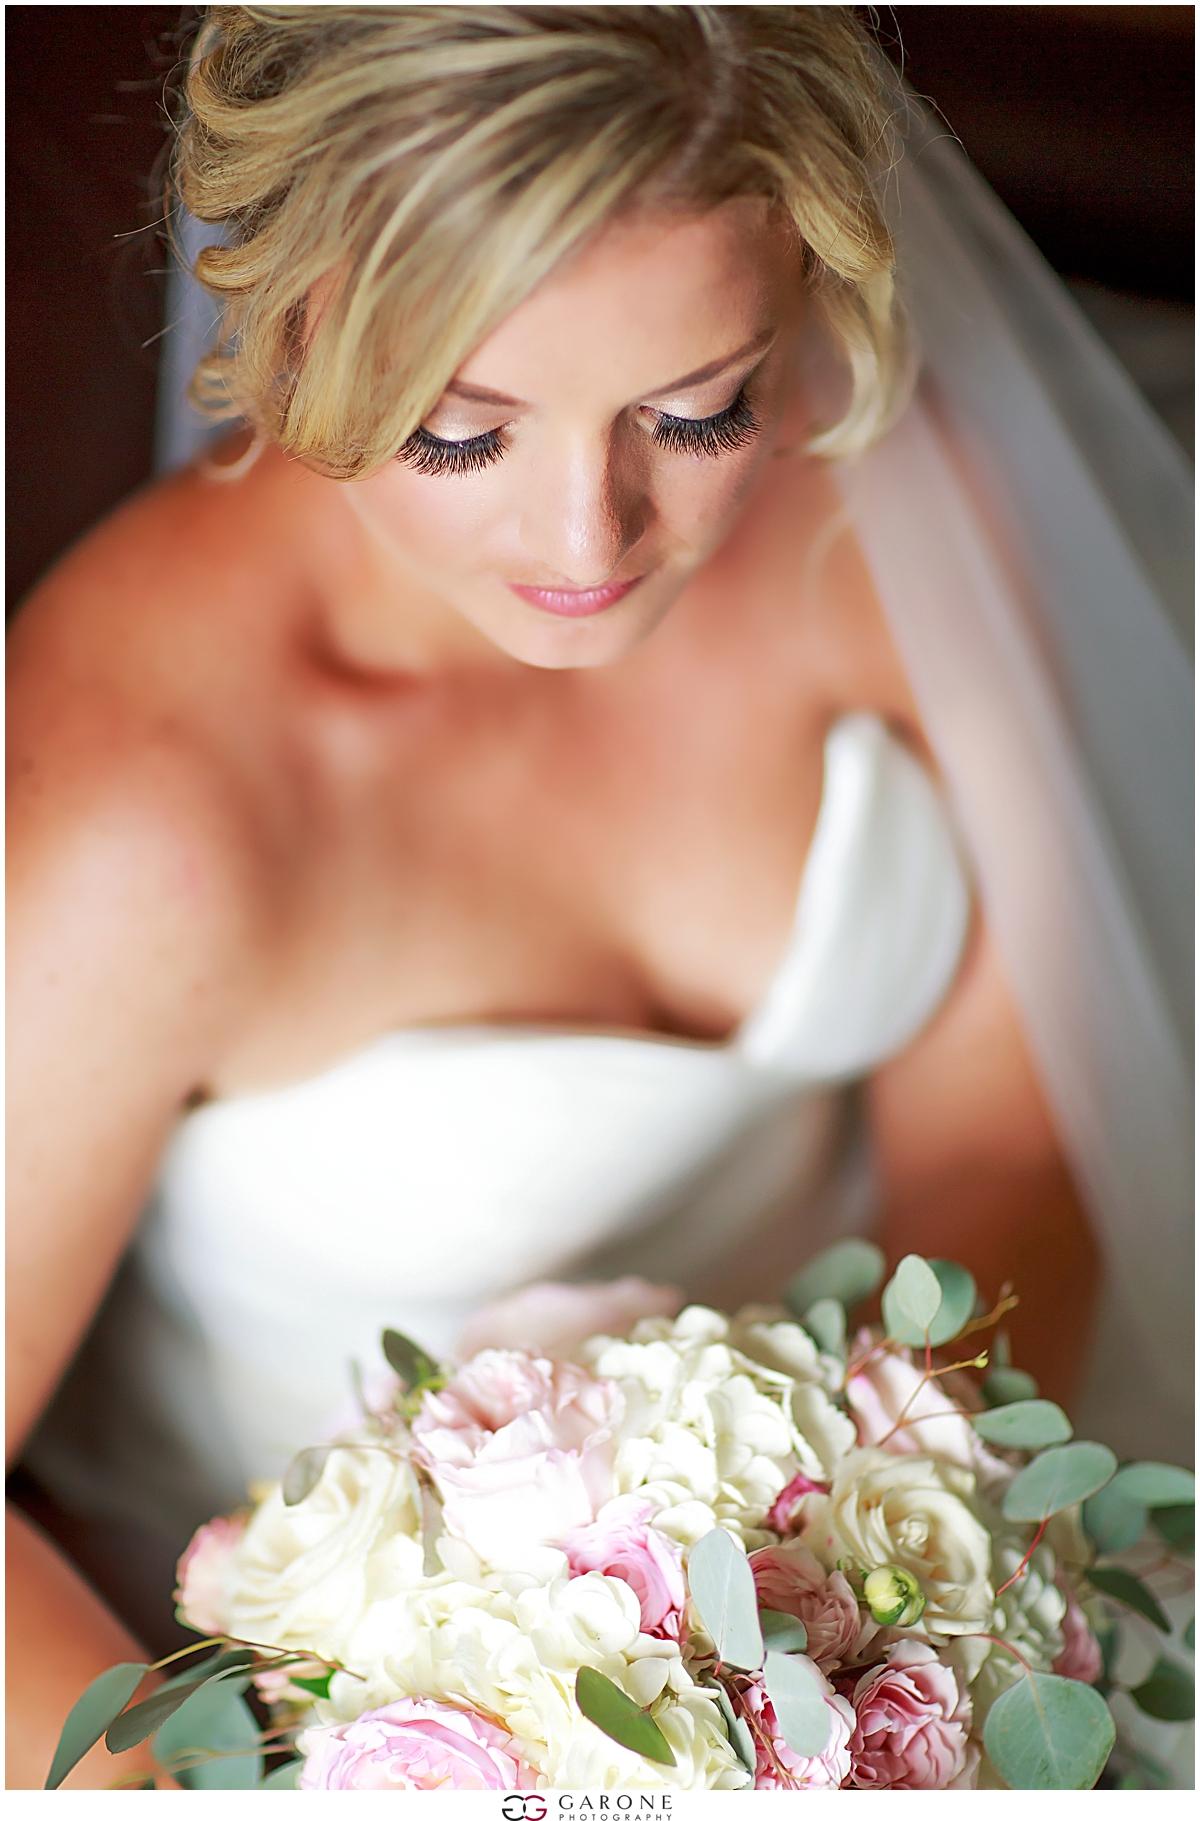 Union_Bluff_Hotel_York_Maine_Wedding_Photography_Beach_Wedding_0015.jpg